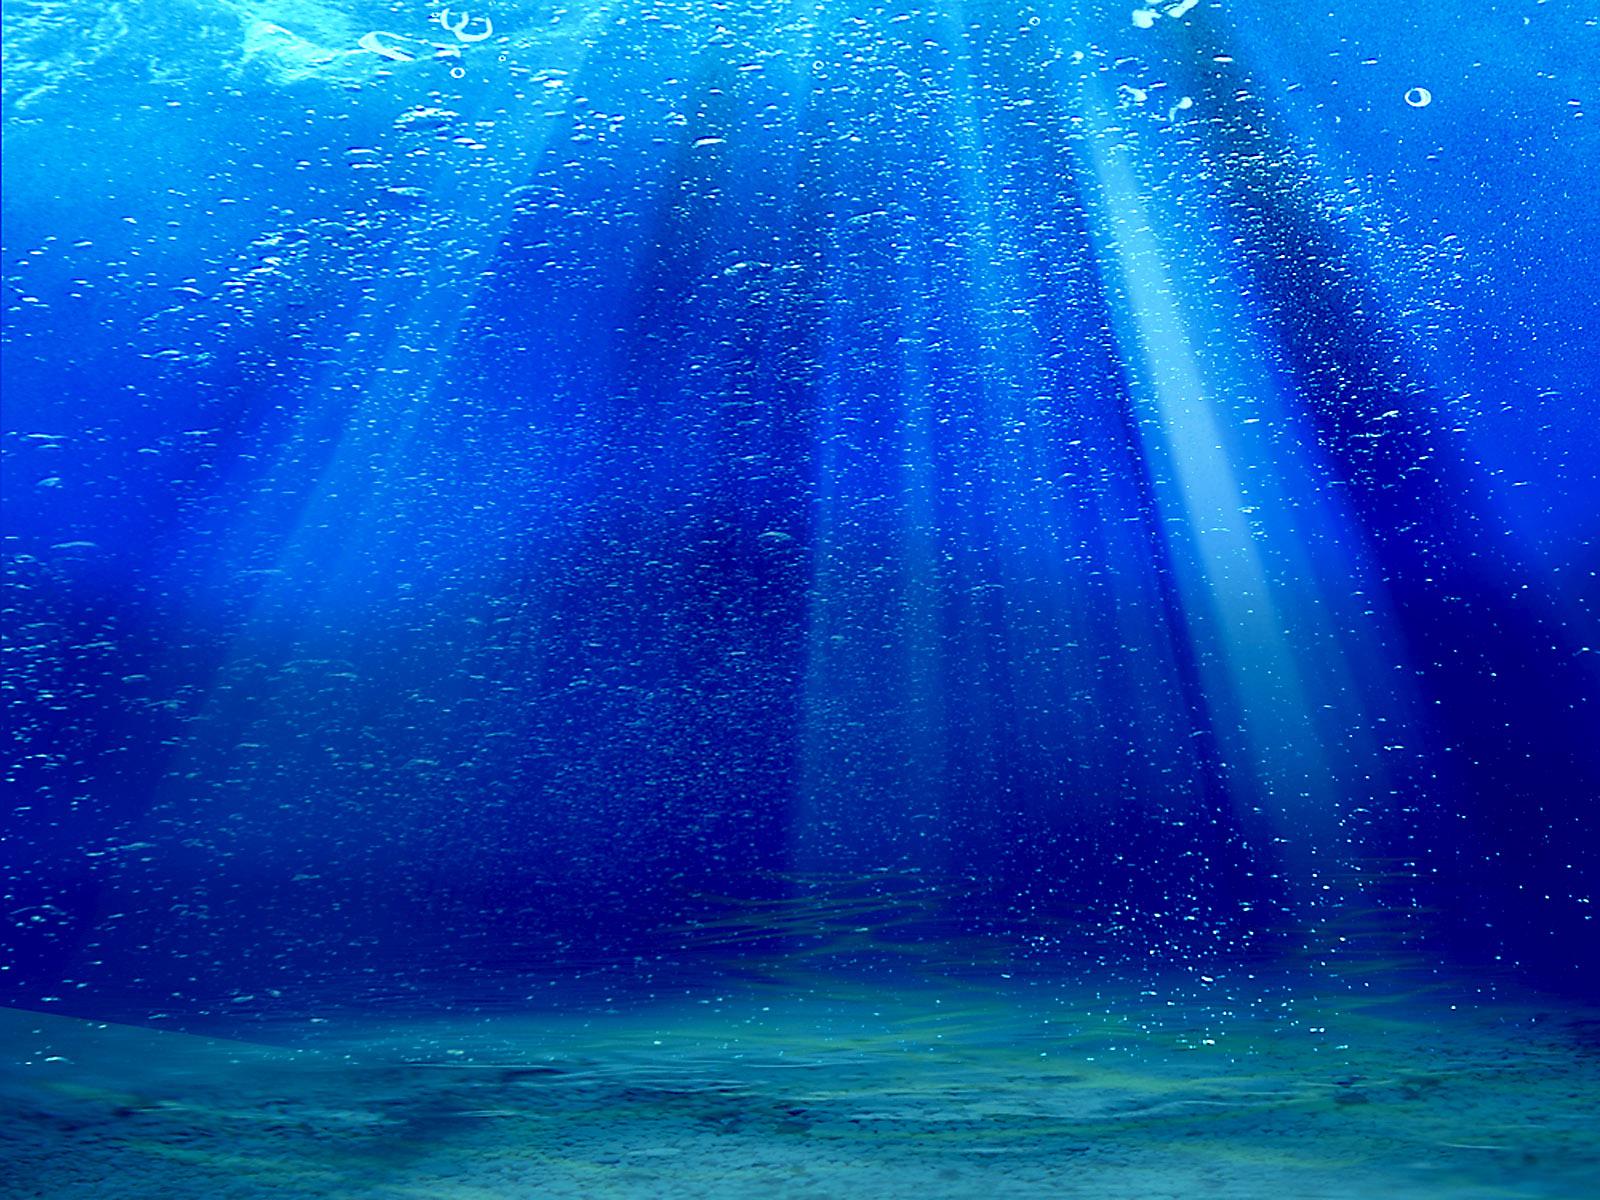 Deep Blue Sea 33